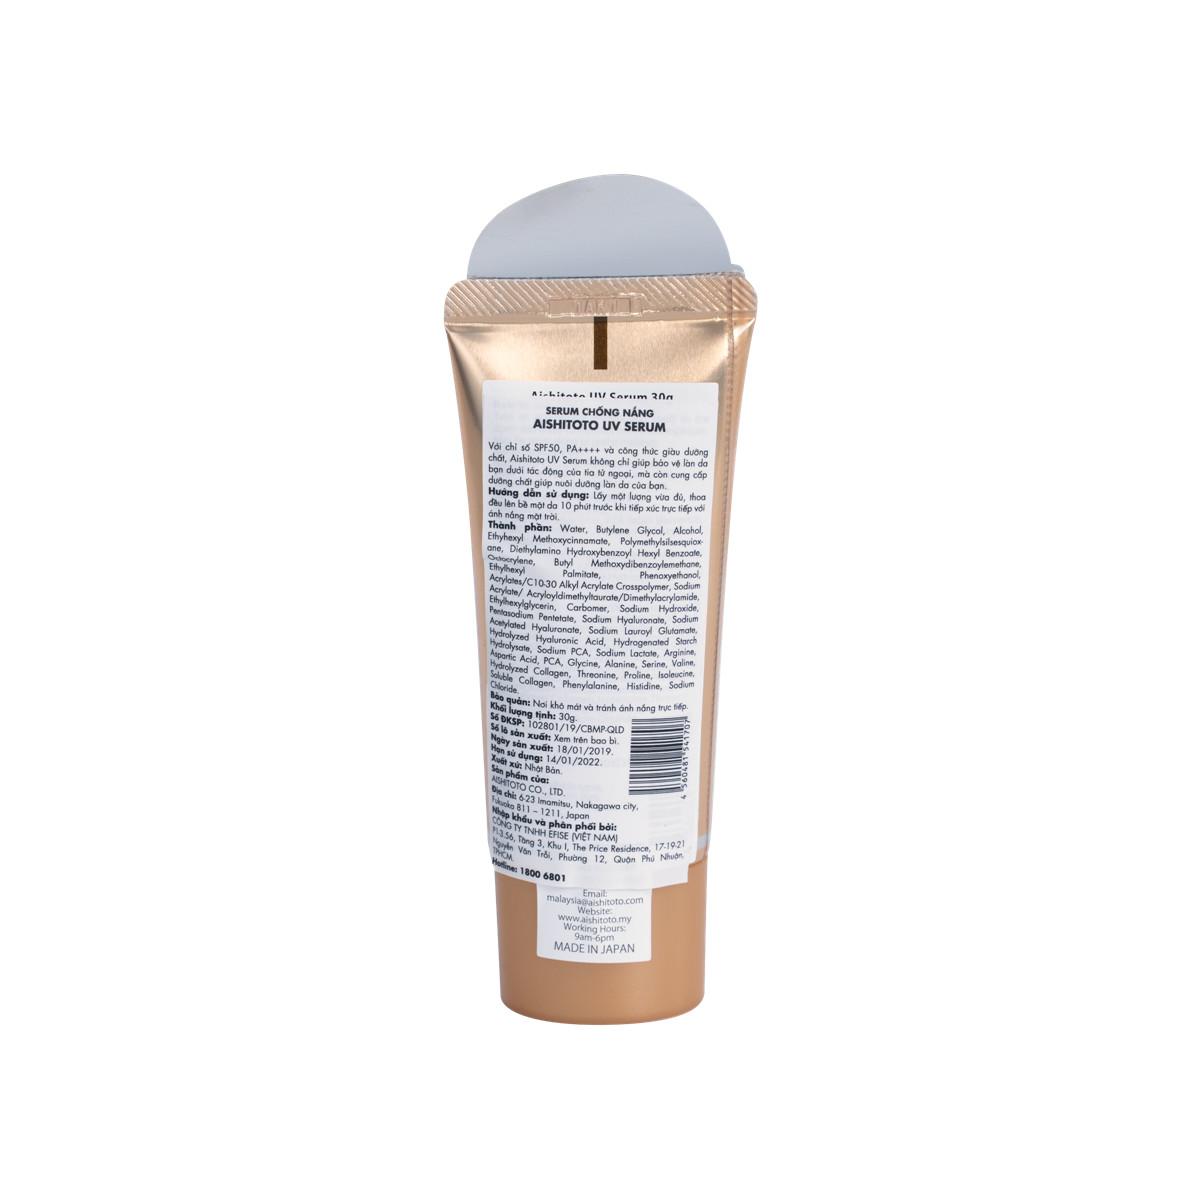 Serum Chống Nắng SPF50 & PA++++ AISHITOTO UV 30g